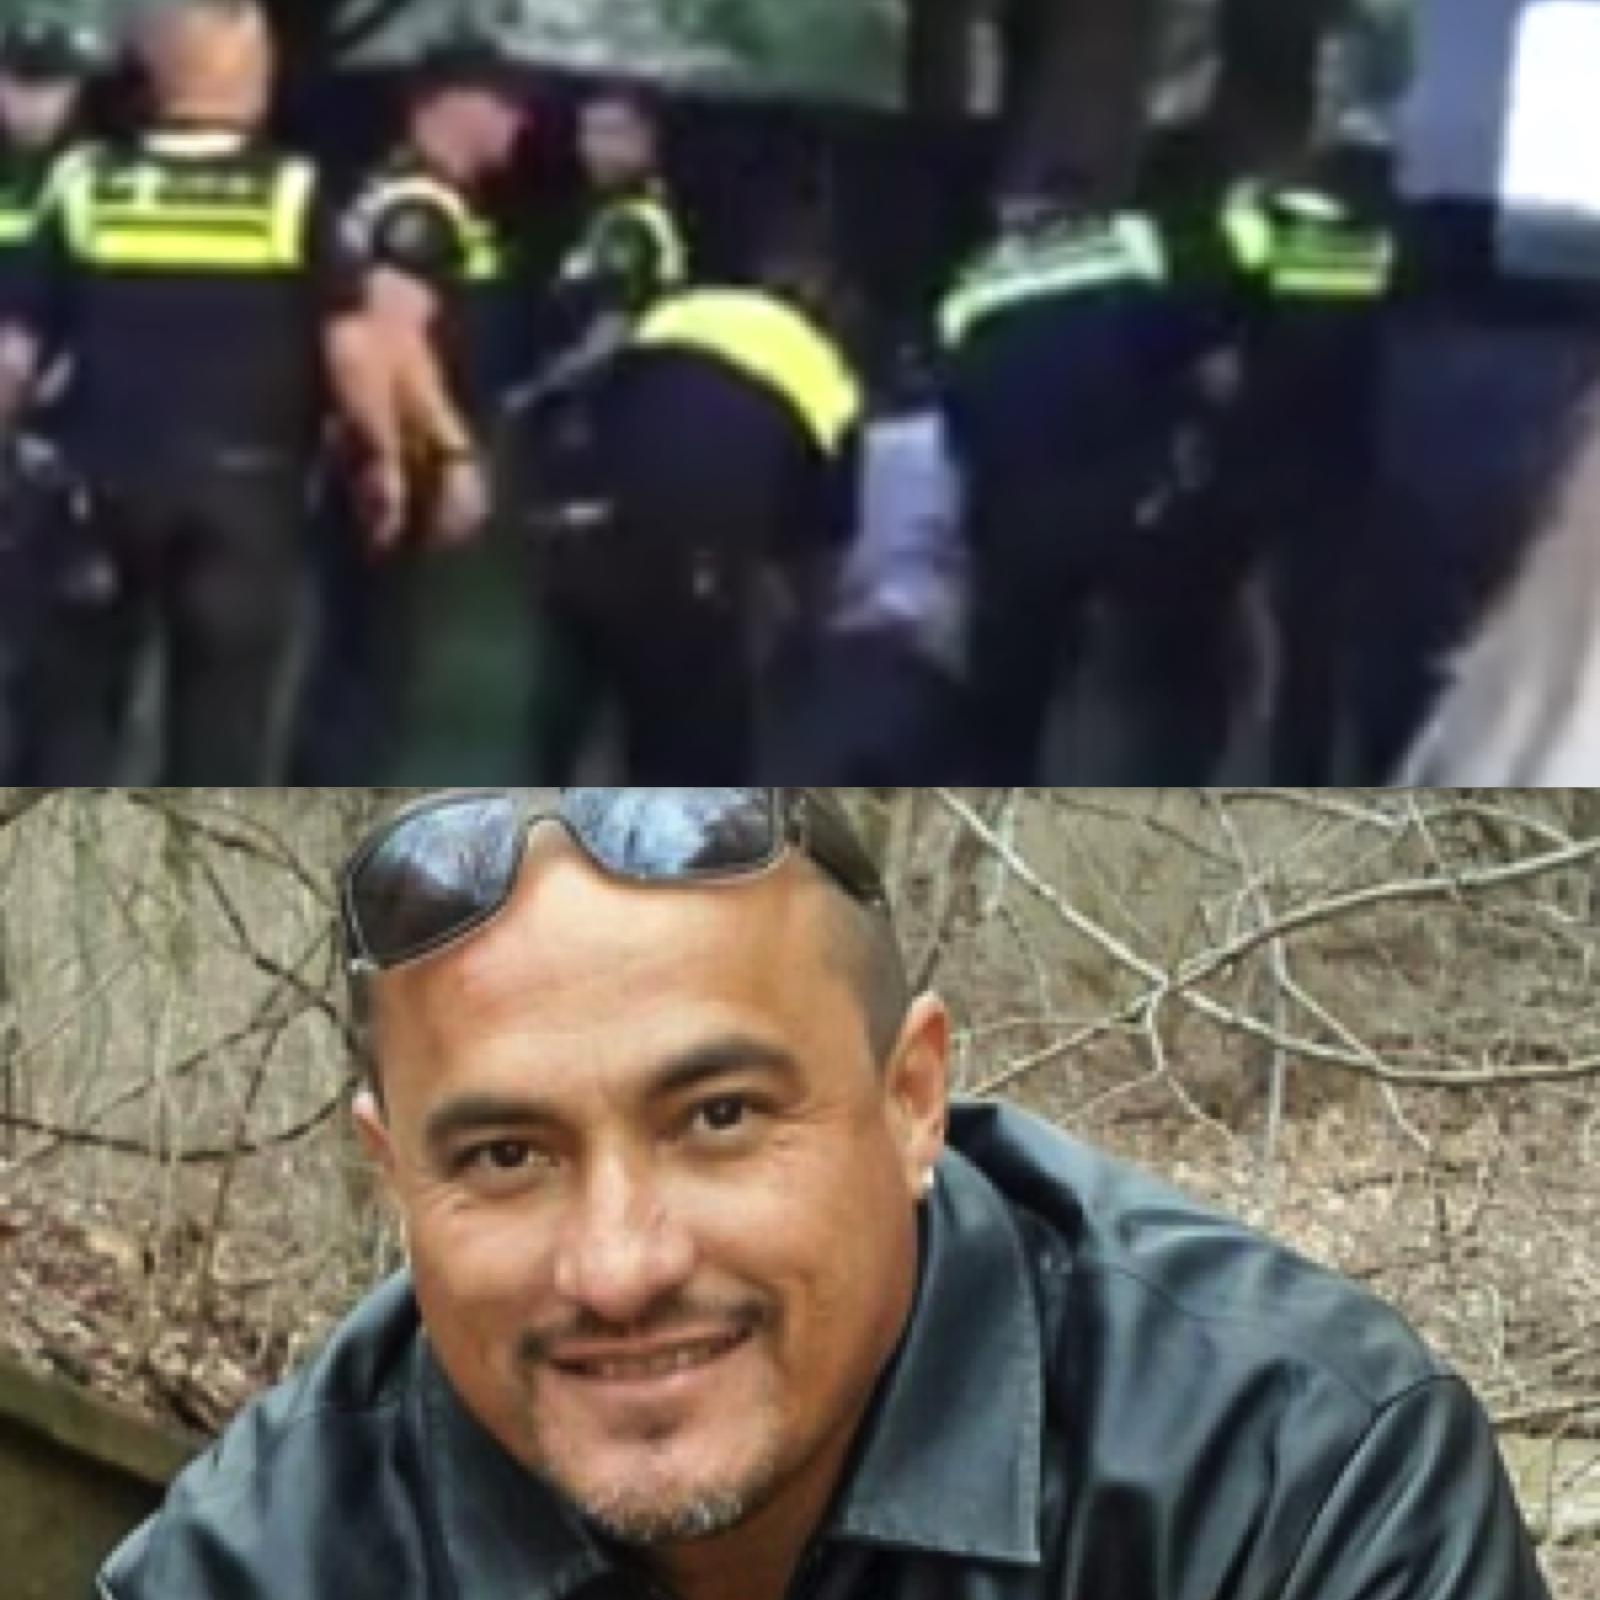 agenten henriquez korpschef, korpschef bouman agenten henriquez, dodelijke arrestatie mitch henriquez